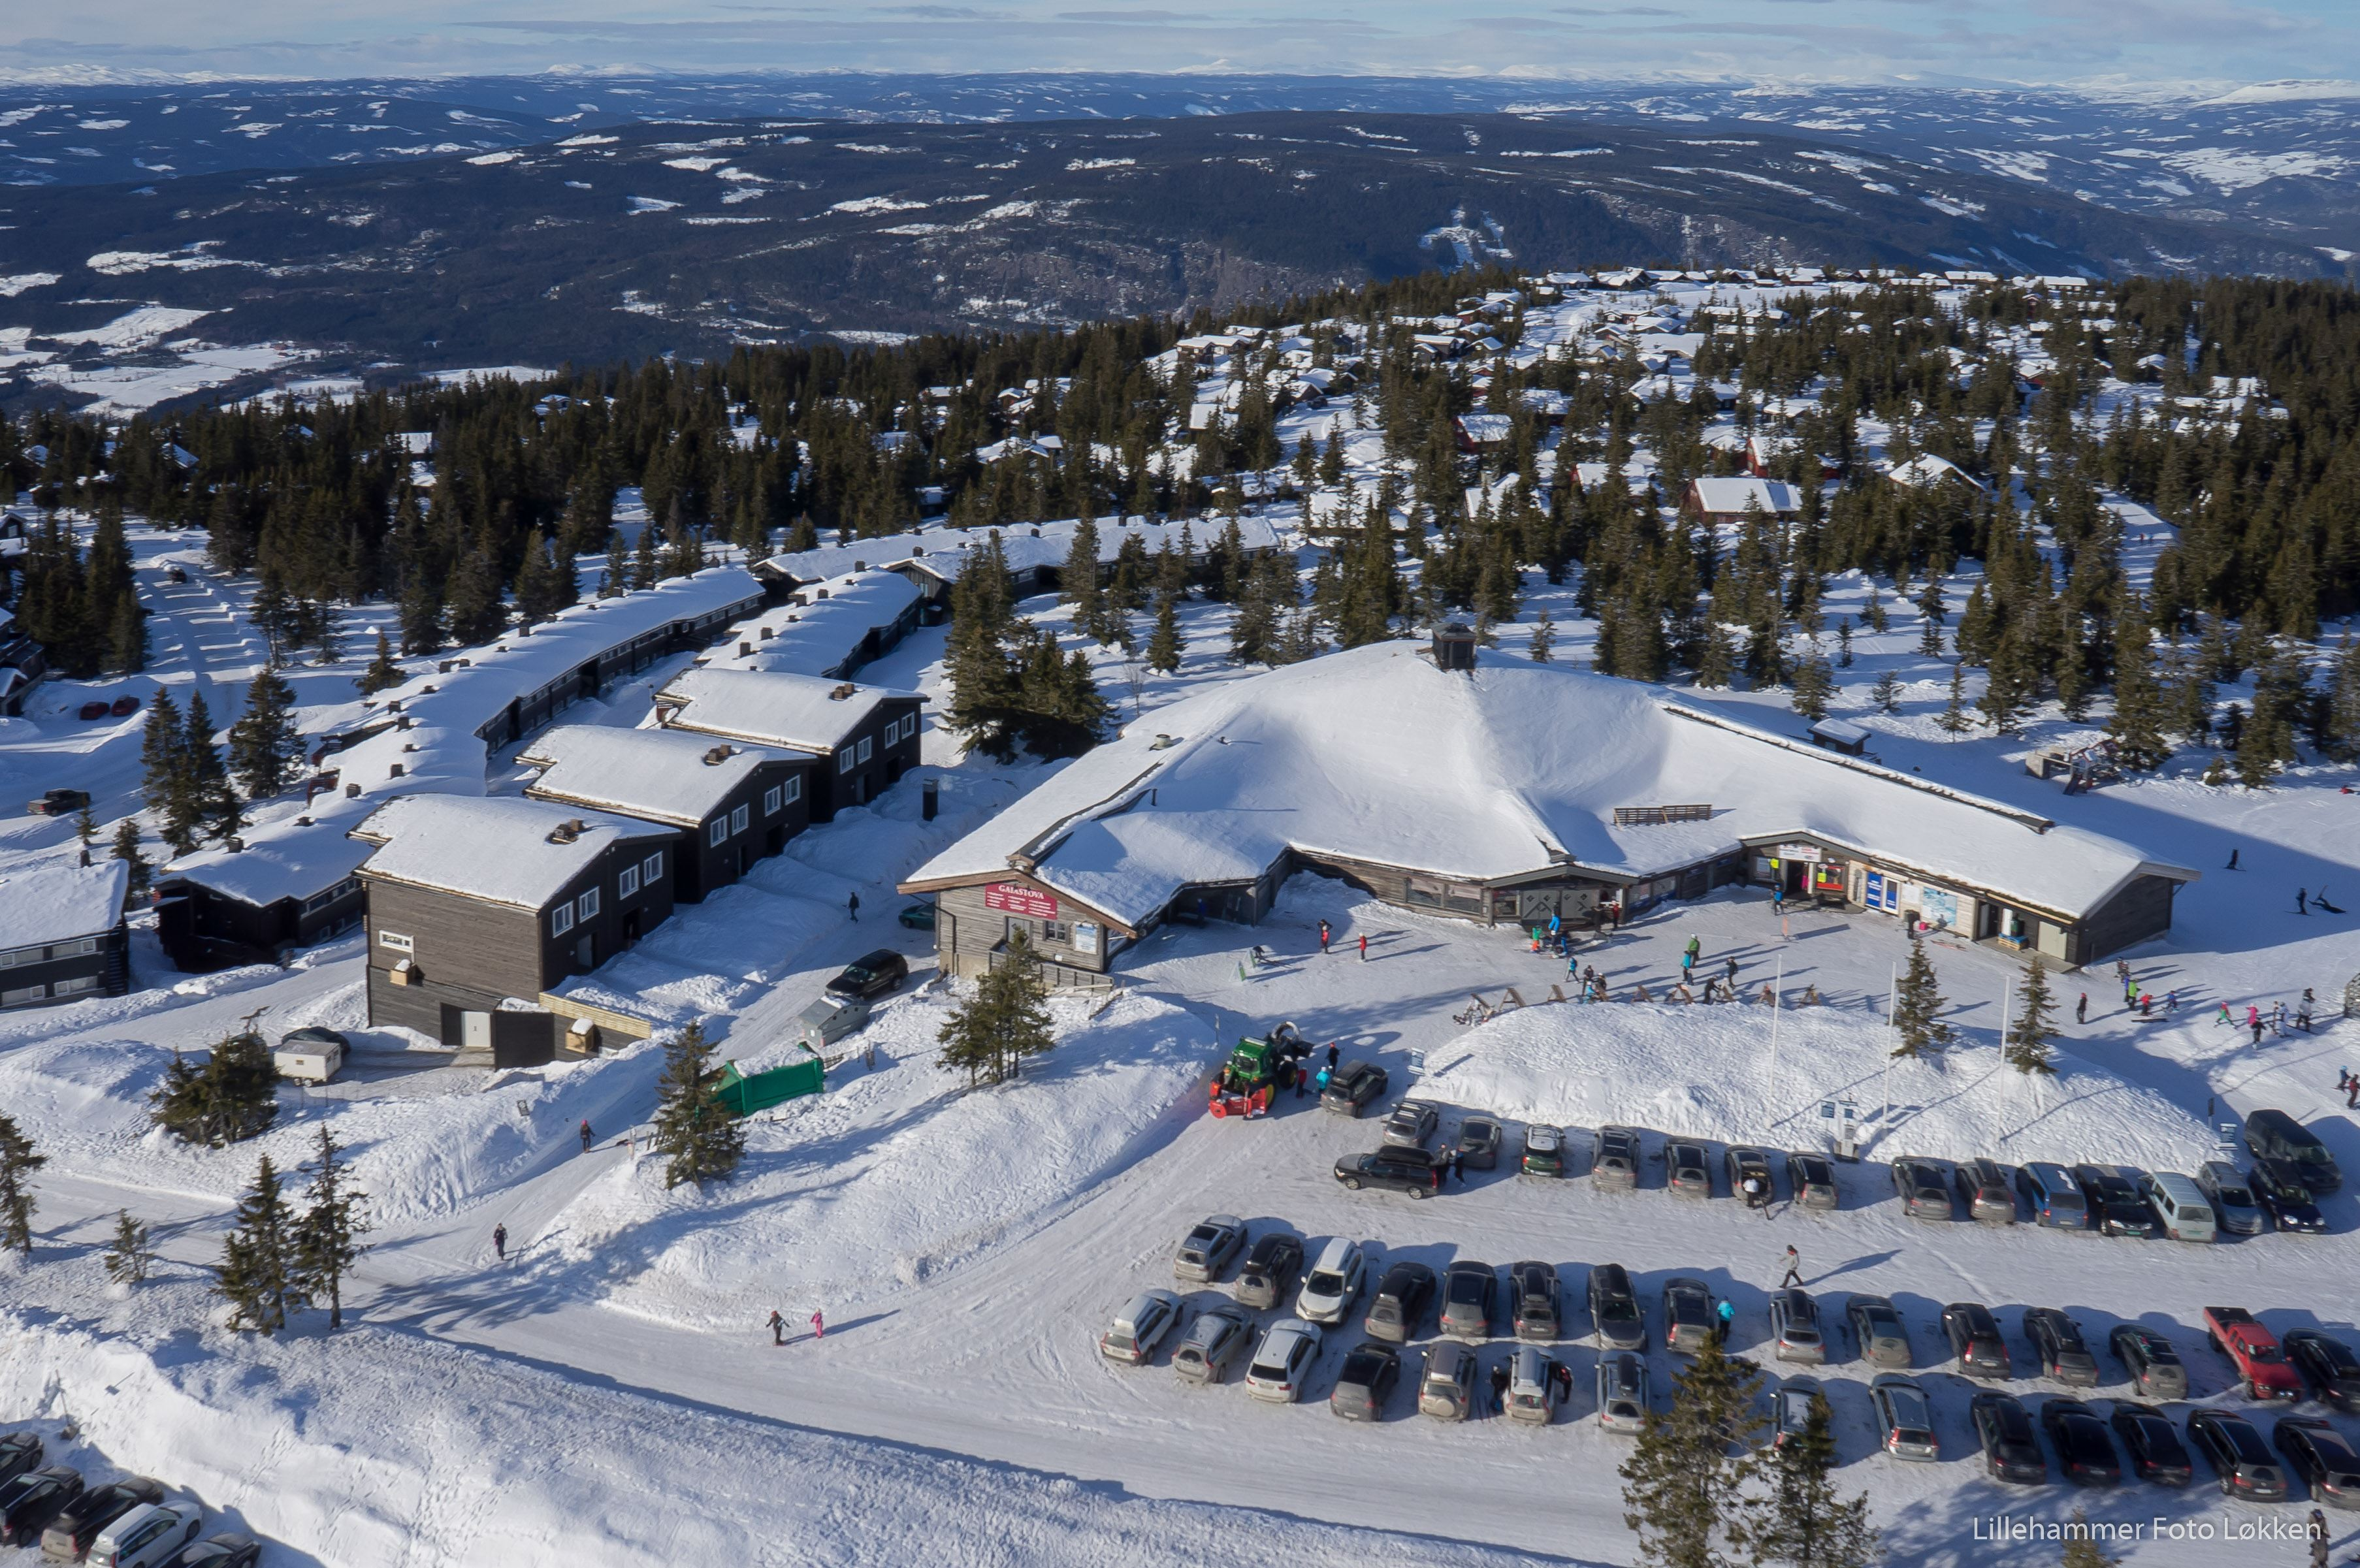 Vinterspretten & afterski 2019 på Gaiastova